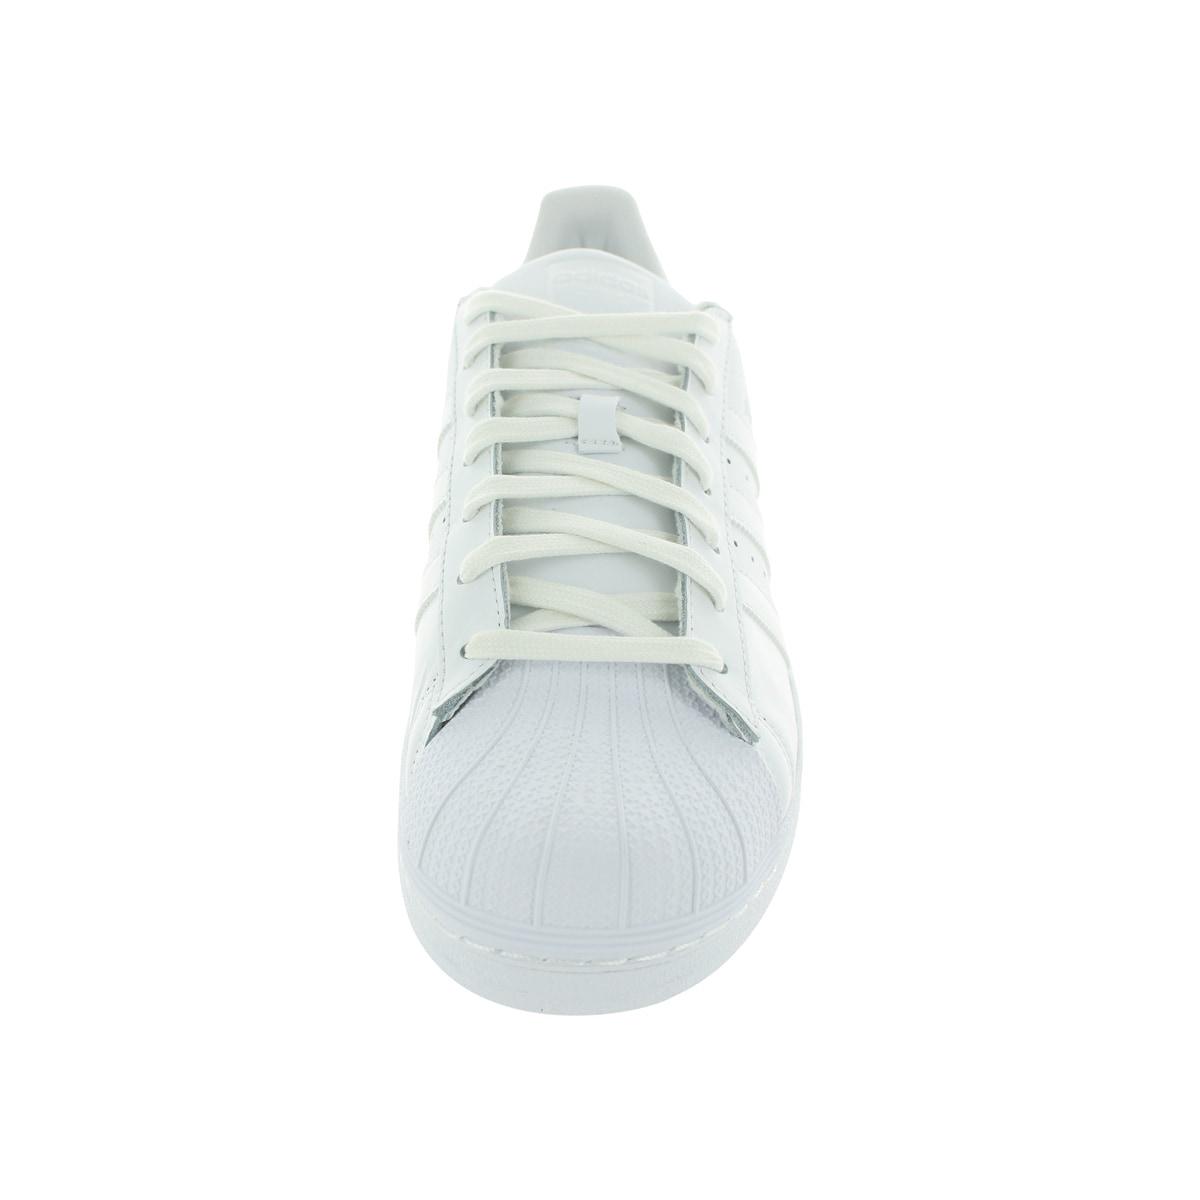 Adidas superstar fondazione uomini bianchi / white / bianco originali.